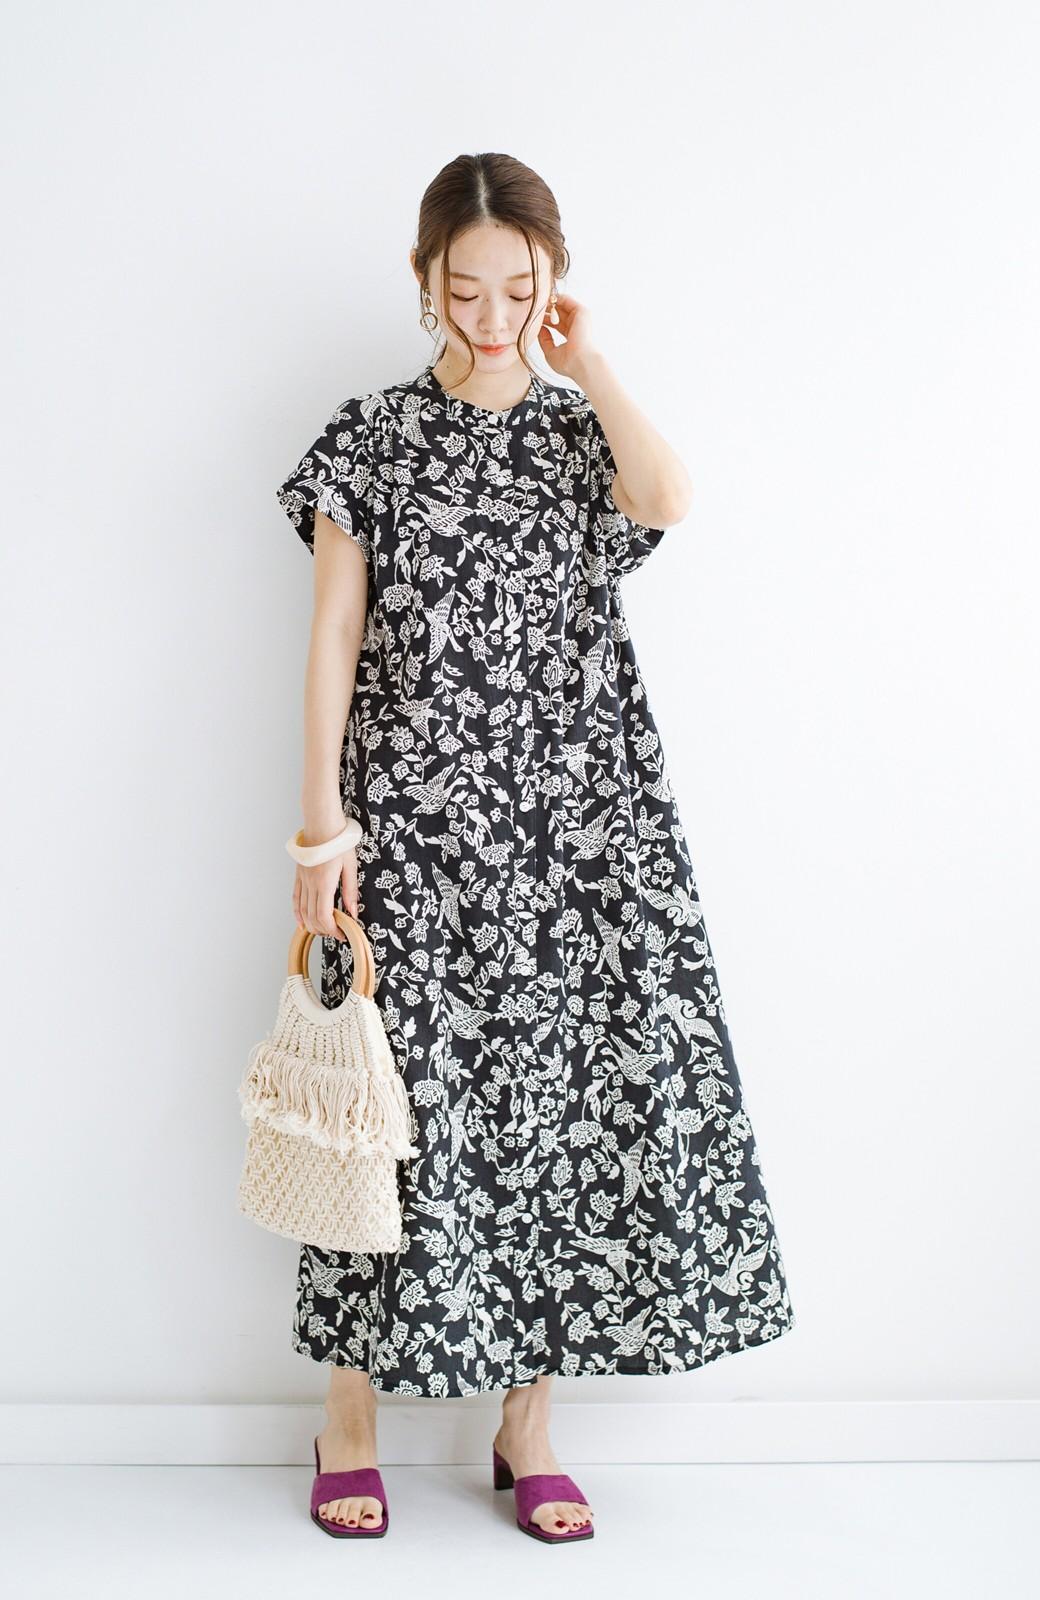 haco! 京都の浴衣屋さんと作った浴衣生地の羽織ってもかわいいロングワンピース <ブラック系その他>の商品写真14